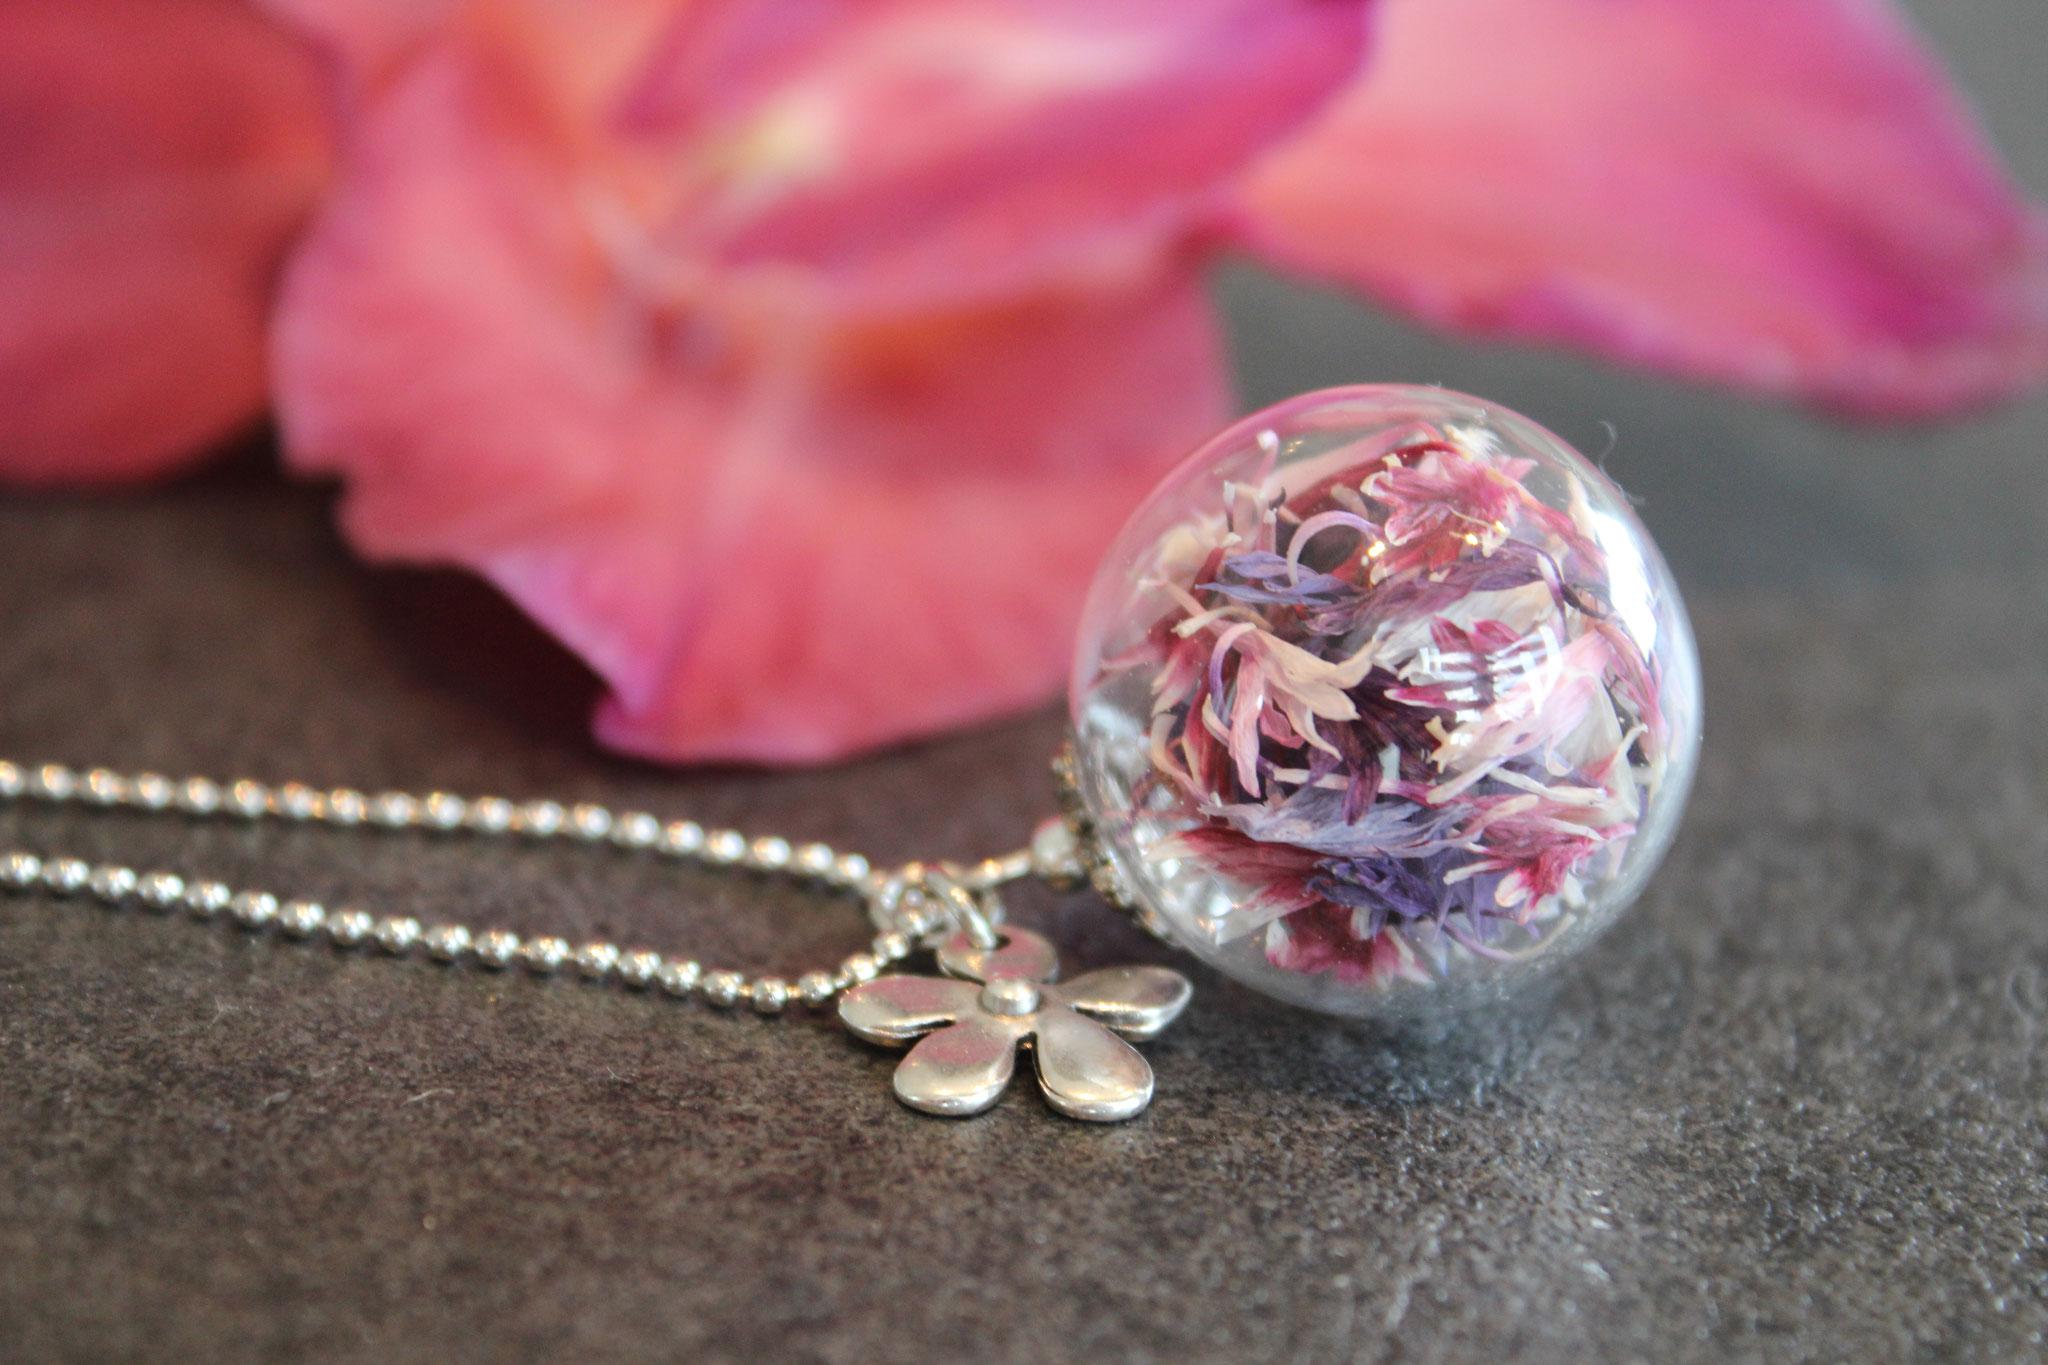 Kornblumenstrauß (lila-rosa Töne)